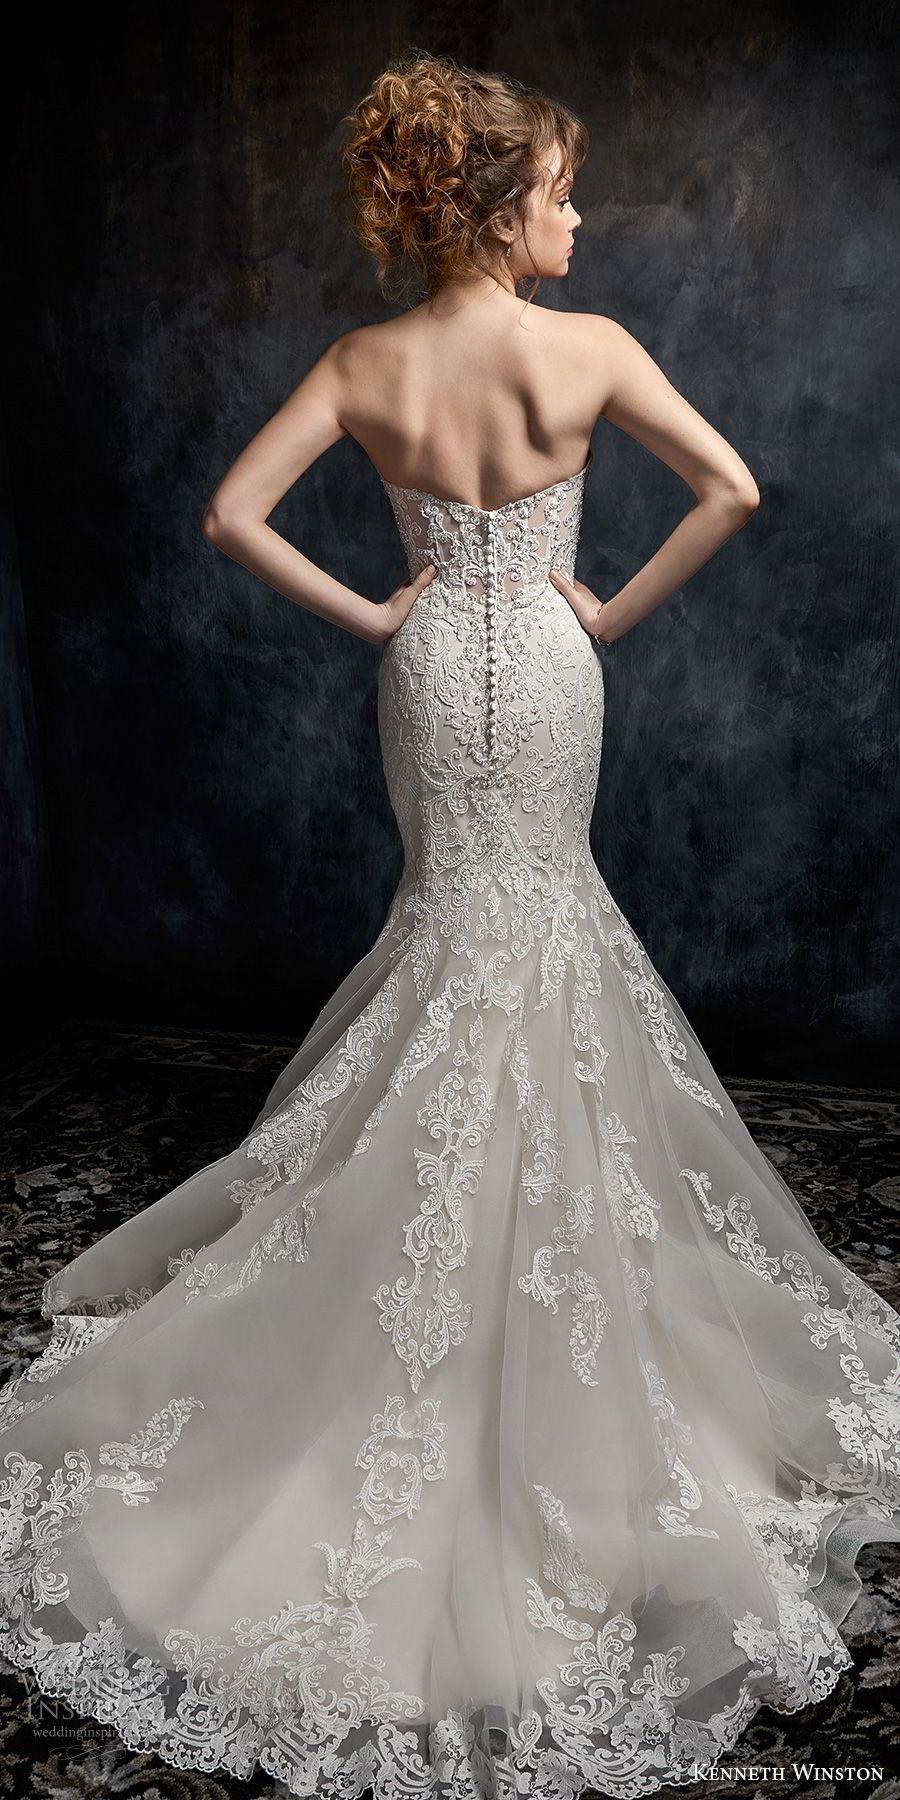 kenneth winston fall 2017 bridal strapless sweetheart neckline full embellishment elegant romantic mermaid wedding dress chapel train (42) bv